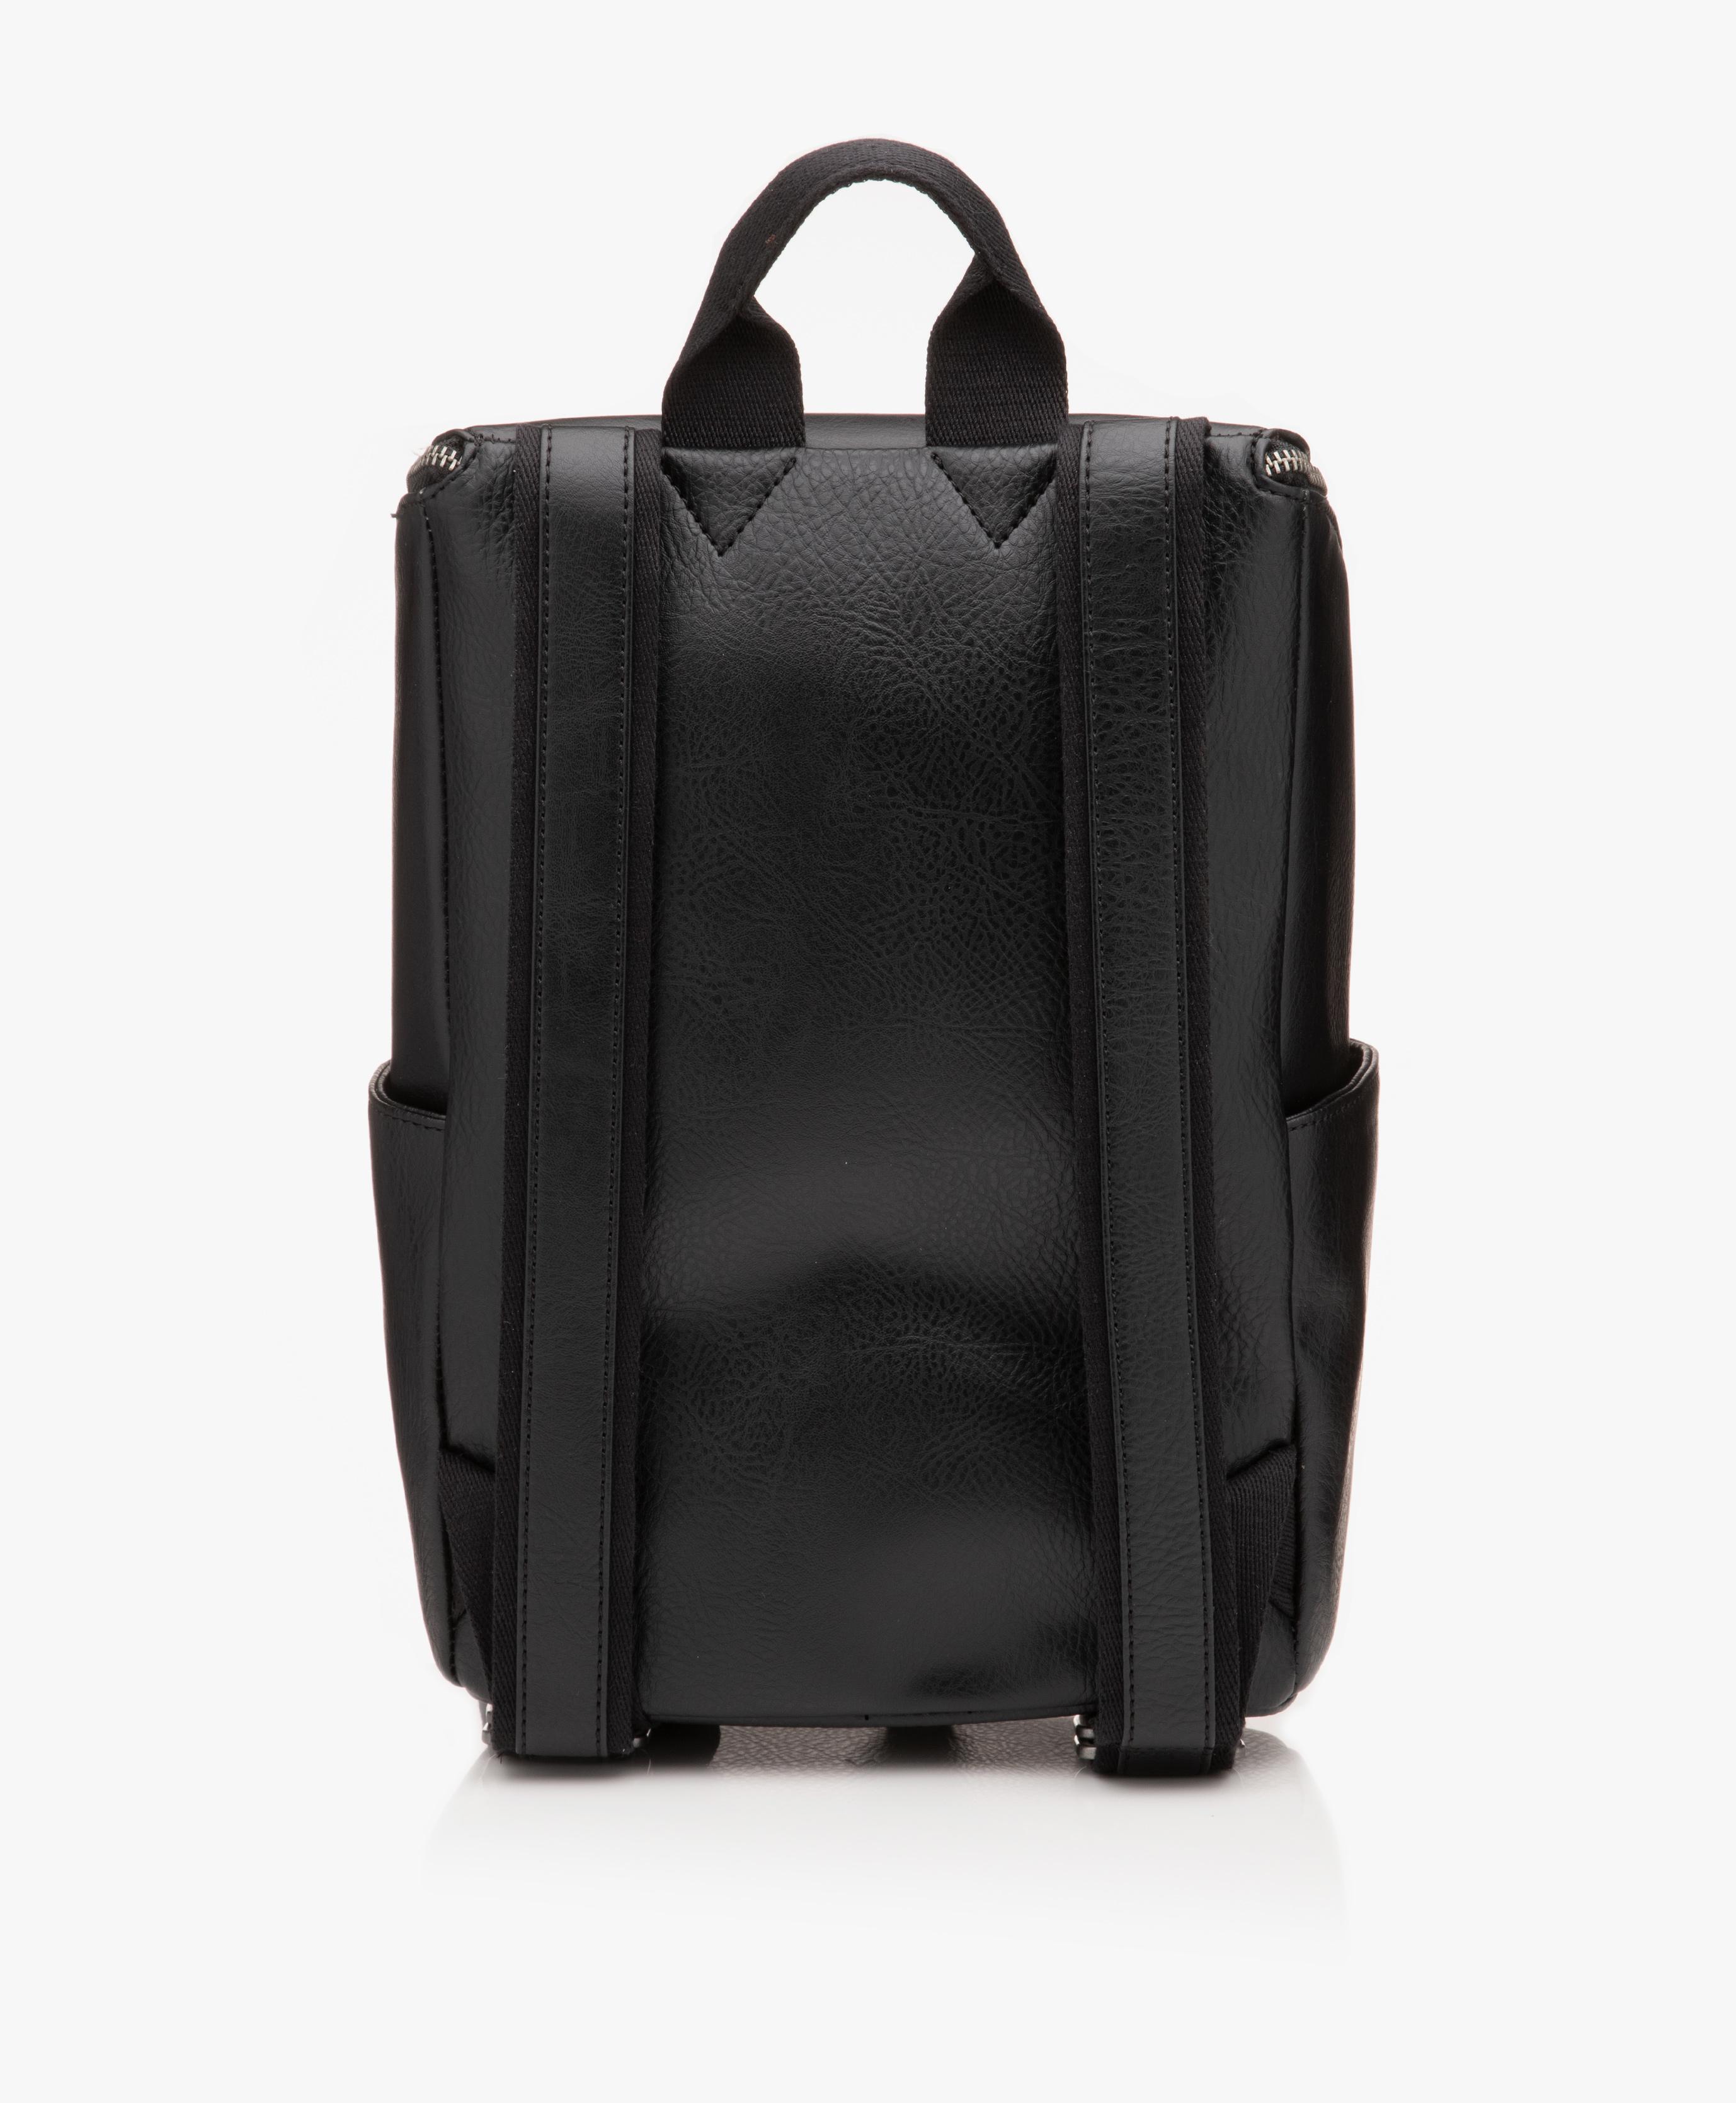 5bd8020221 Matt   Nat Brave Dwell Backpack - Black - brave